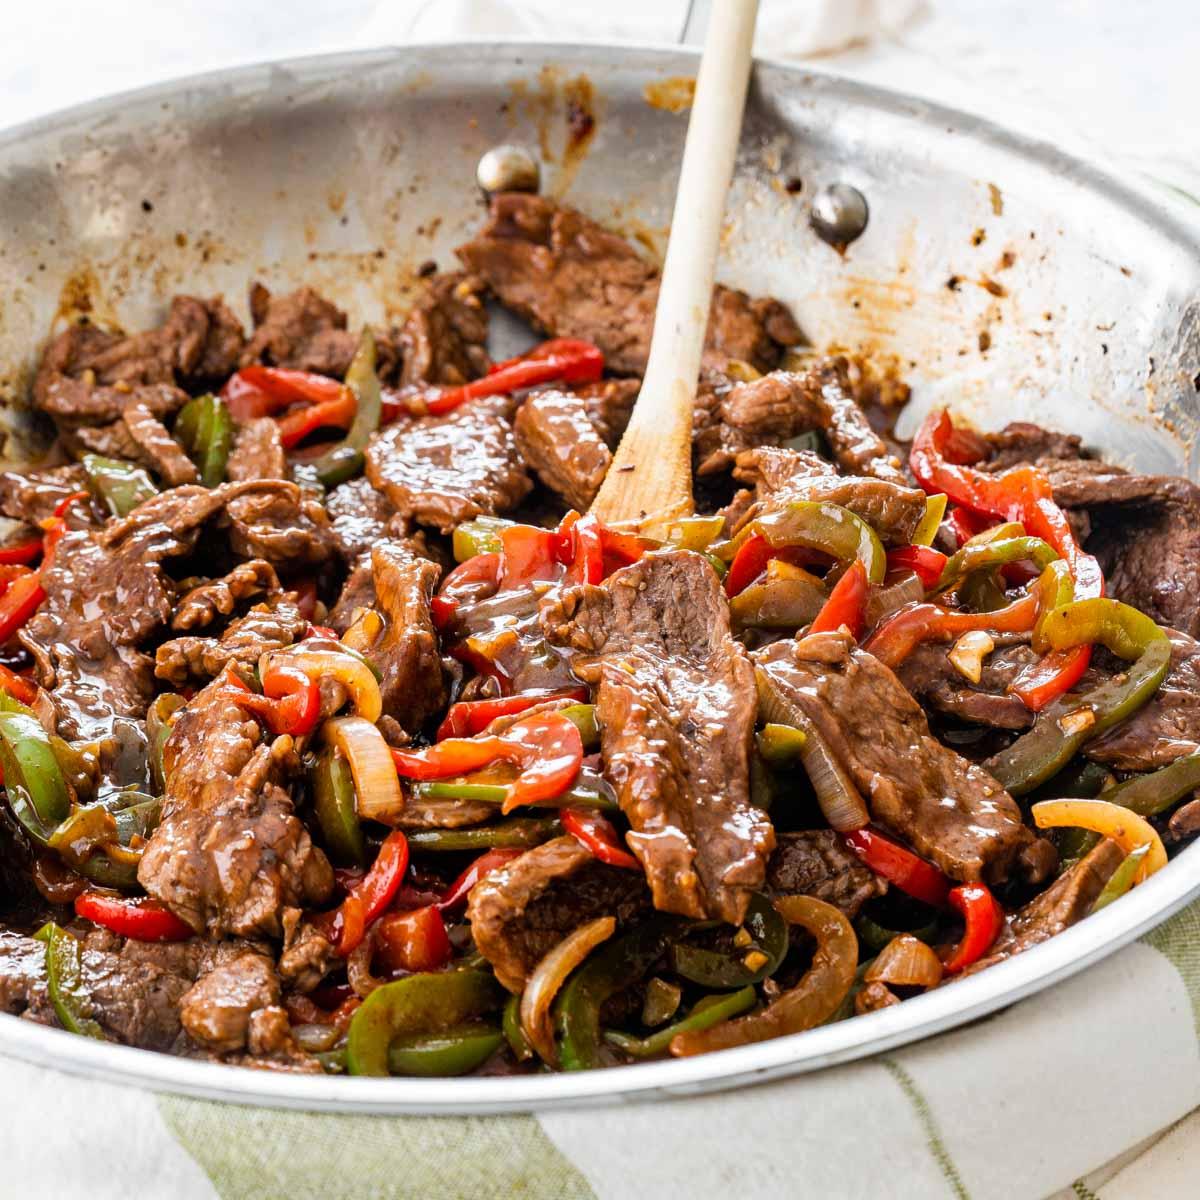 freshly made pepper steak in a skillet